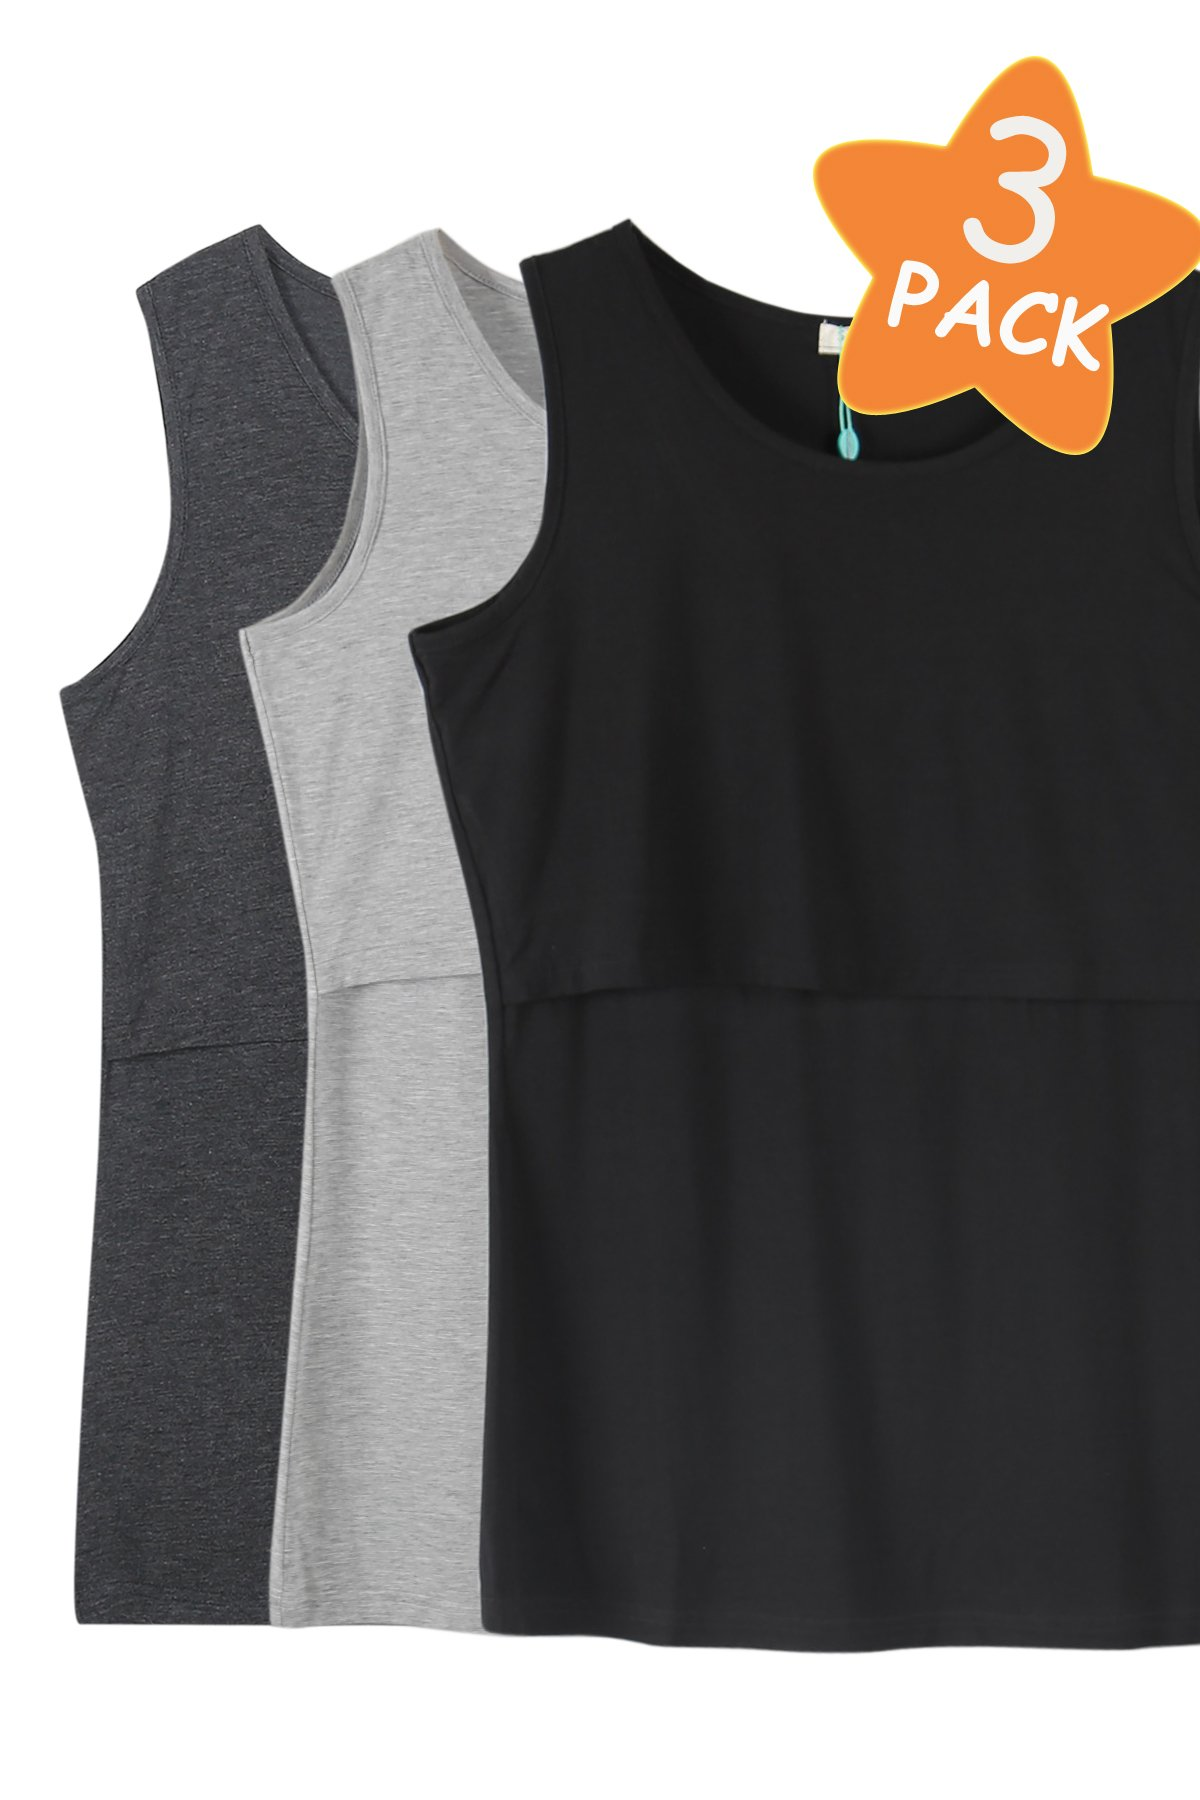 Smallshow Women's 3 Pack Sleeveless Maternity Nursing Tank Tops Large,Deep Grey-Black-Grey